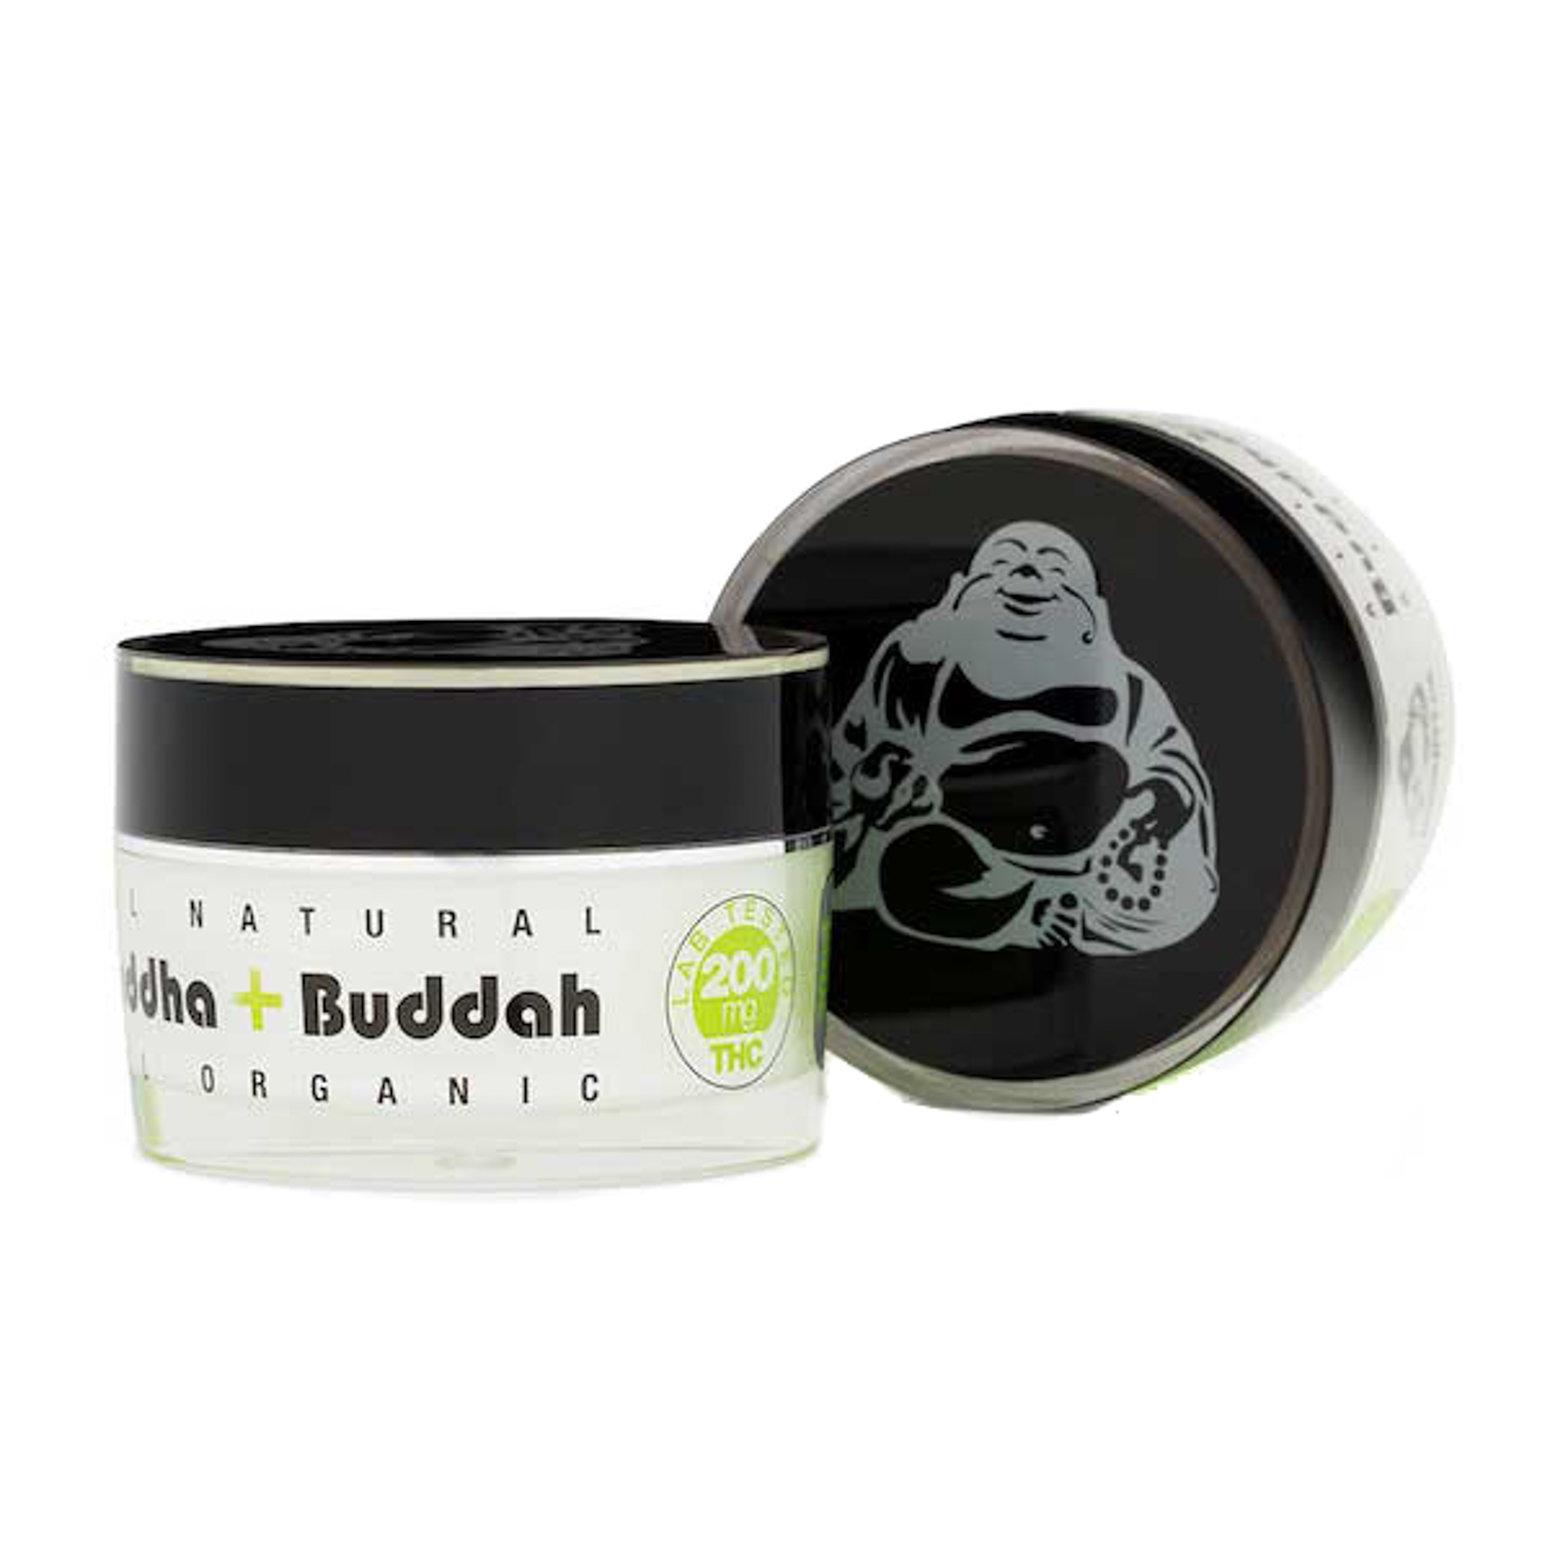 Buddha Buddah by Miss Envy Botanicals 01172